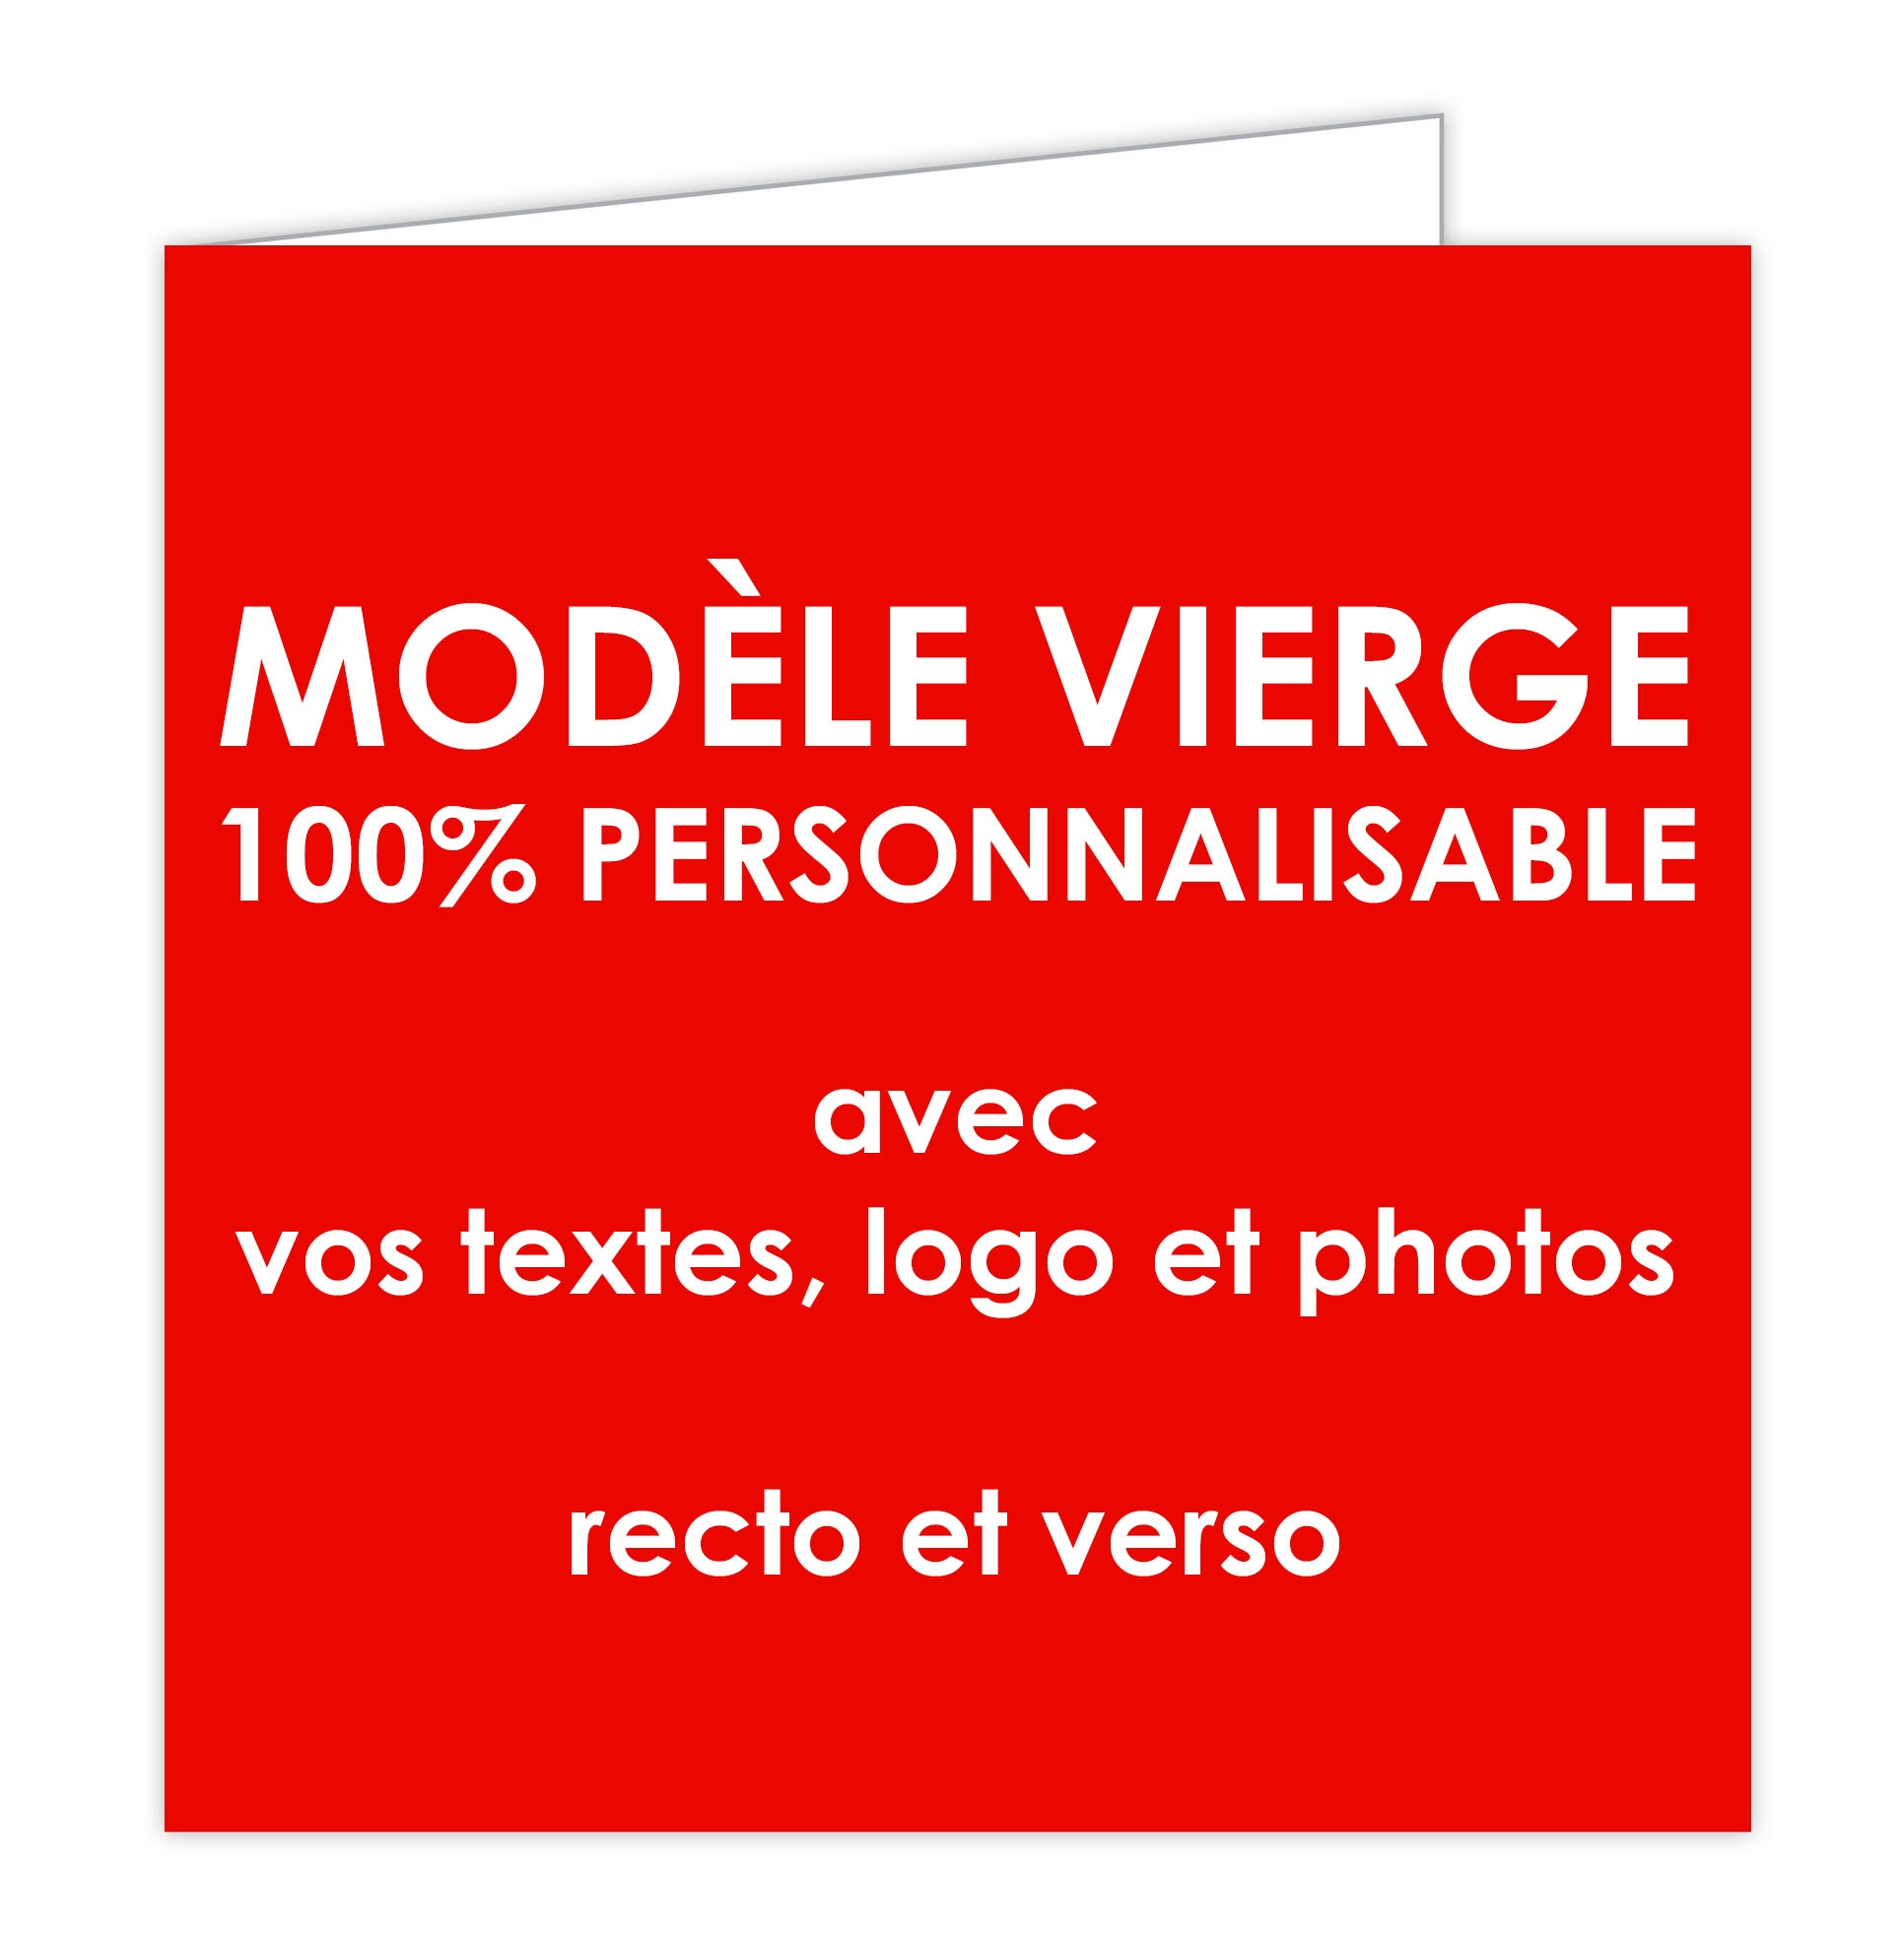 Carte nouvel an personnalisee gratuite for Carte de voeux personnalisee gratuite a imprimer